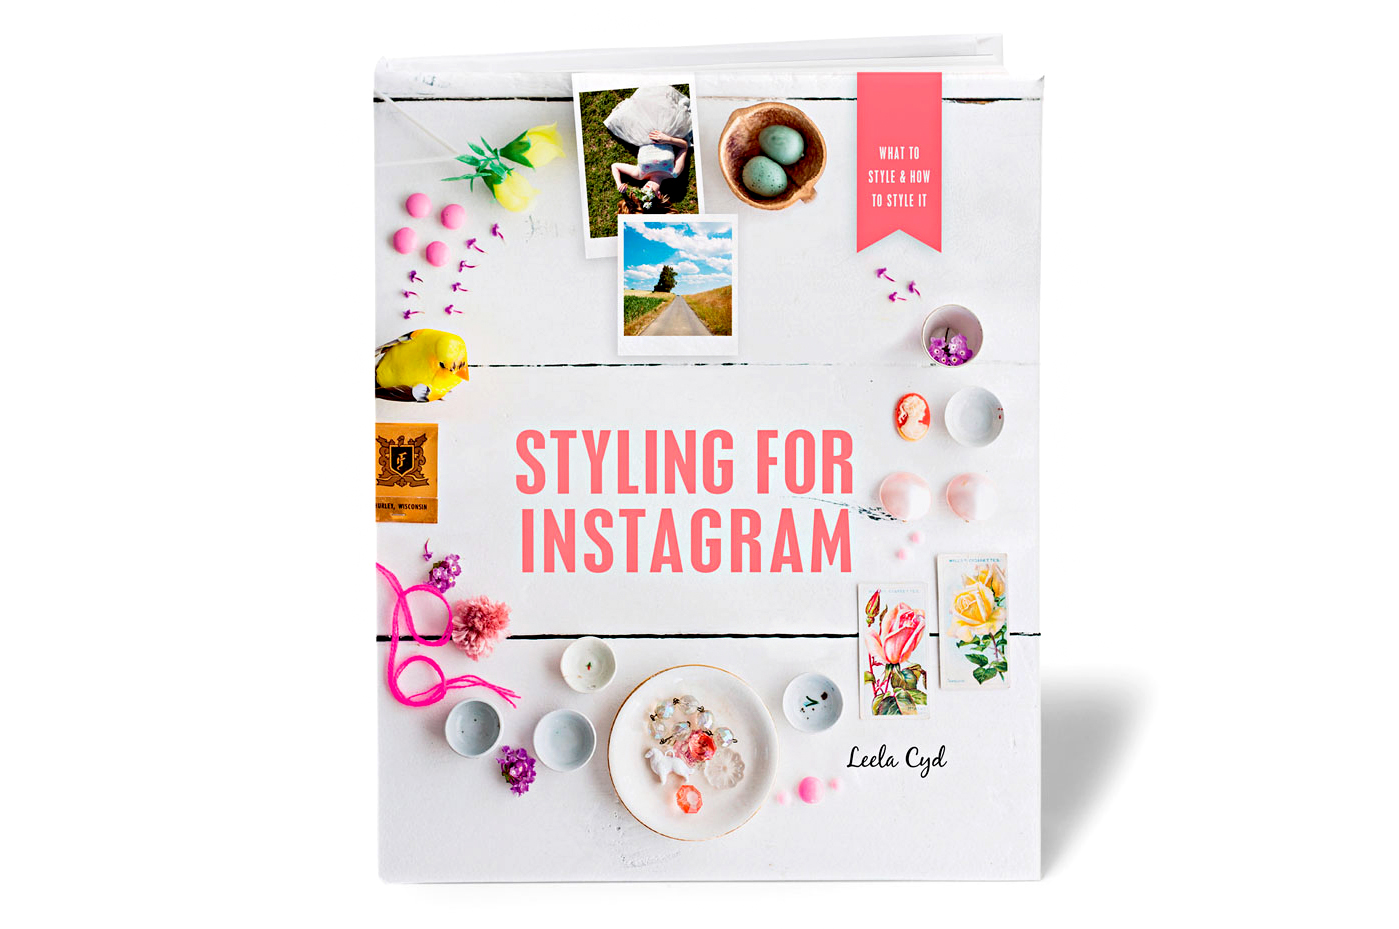 leela-cyd-styling-for-instagram-book-0418-103339969